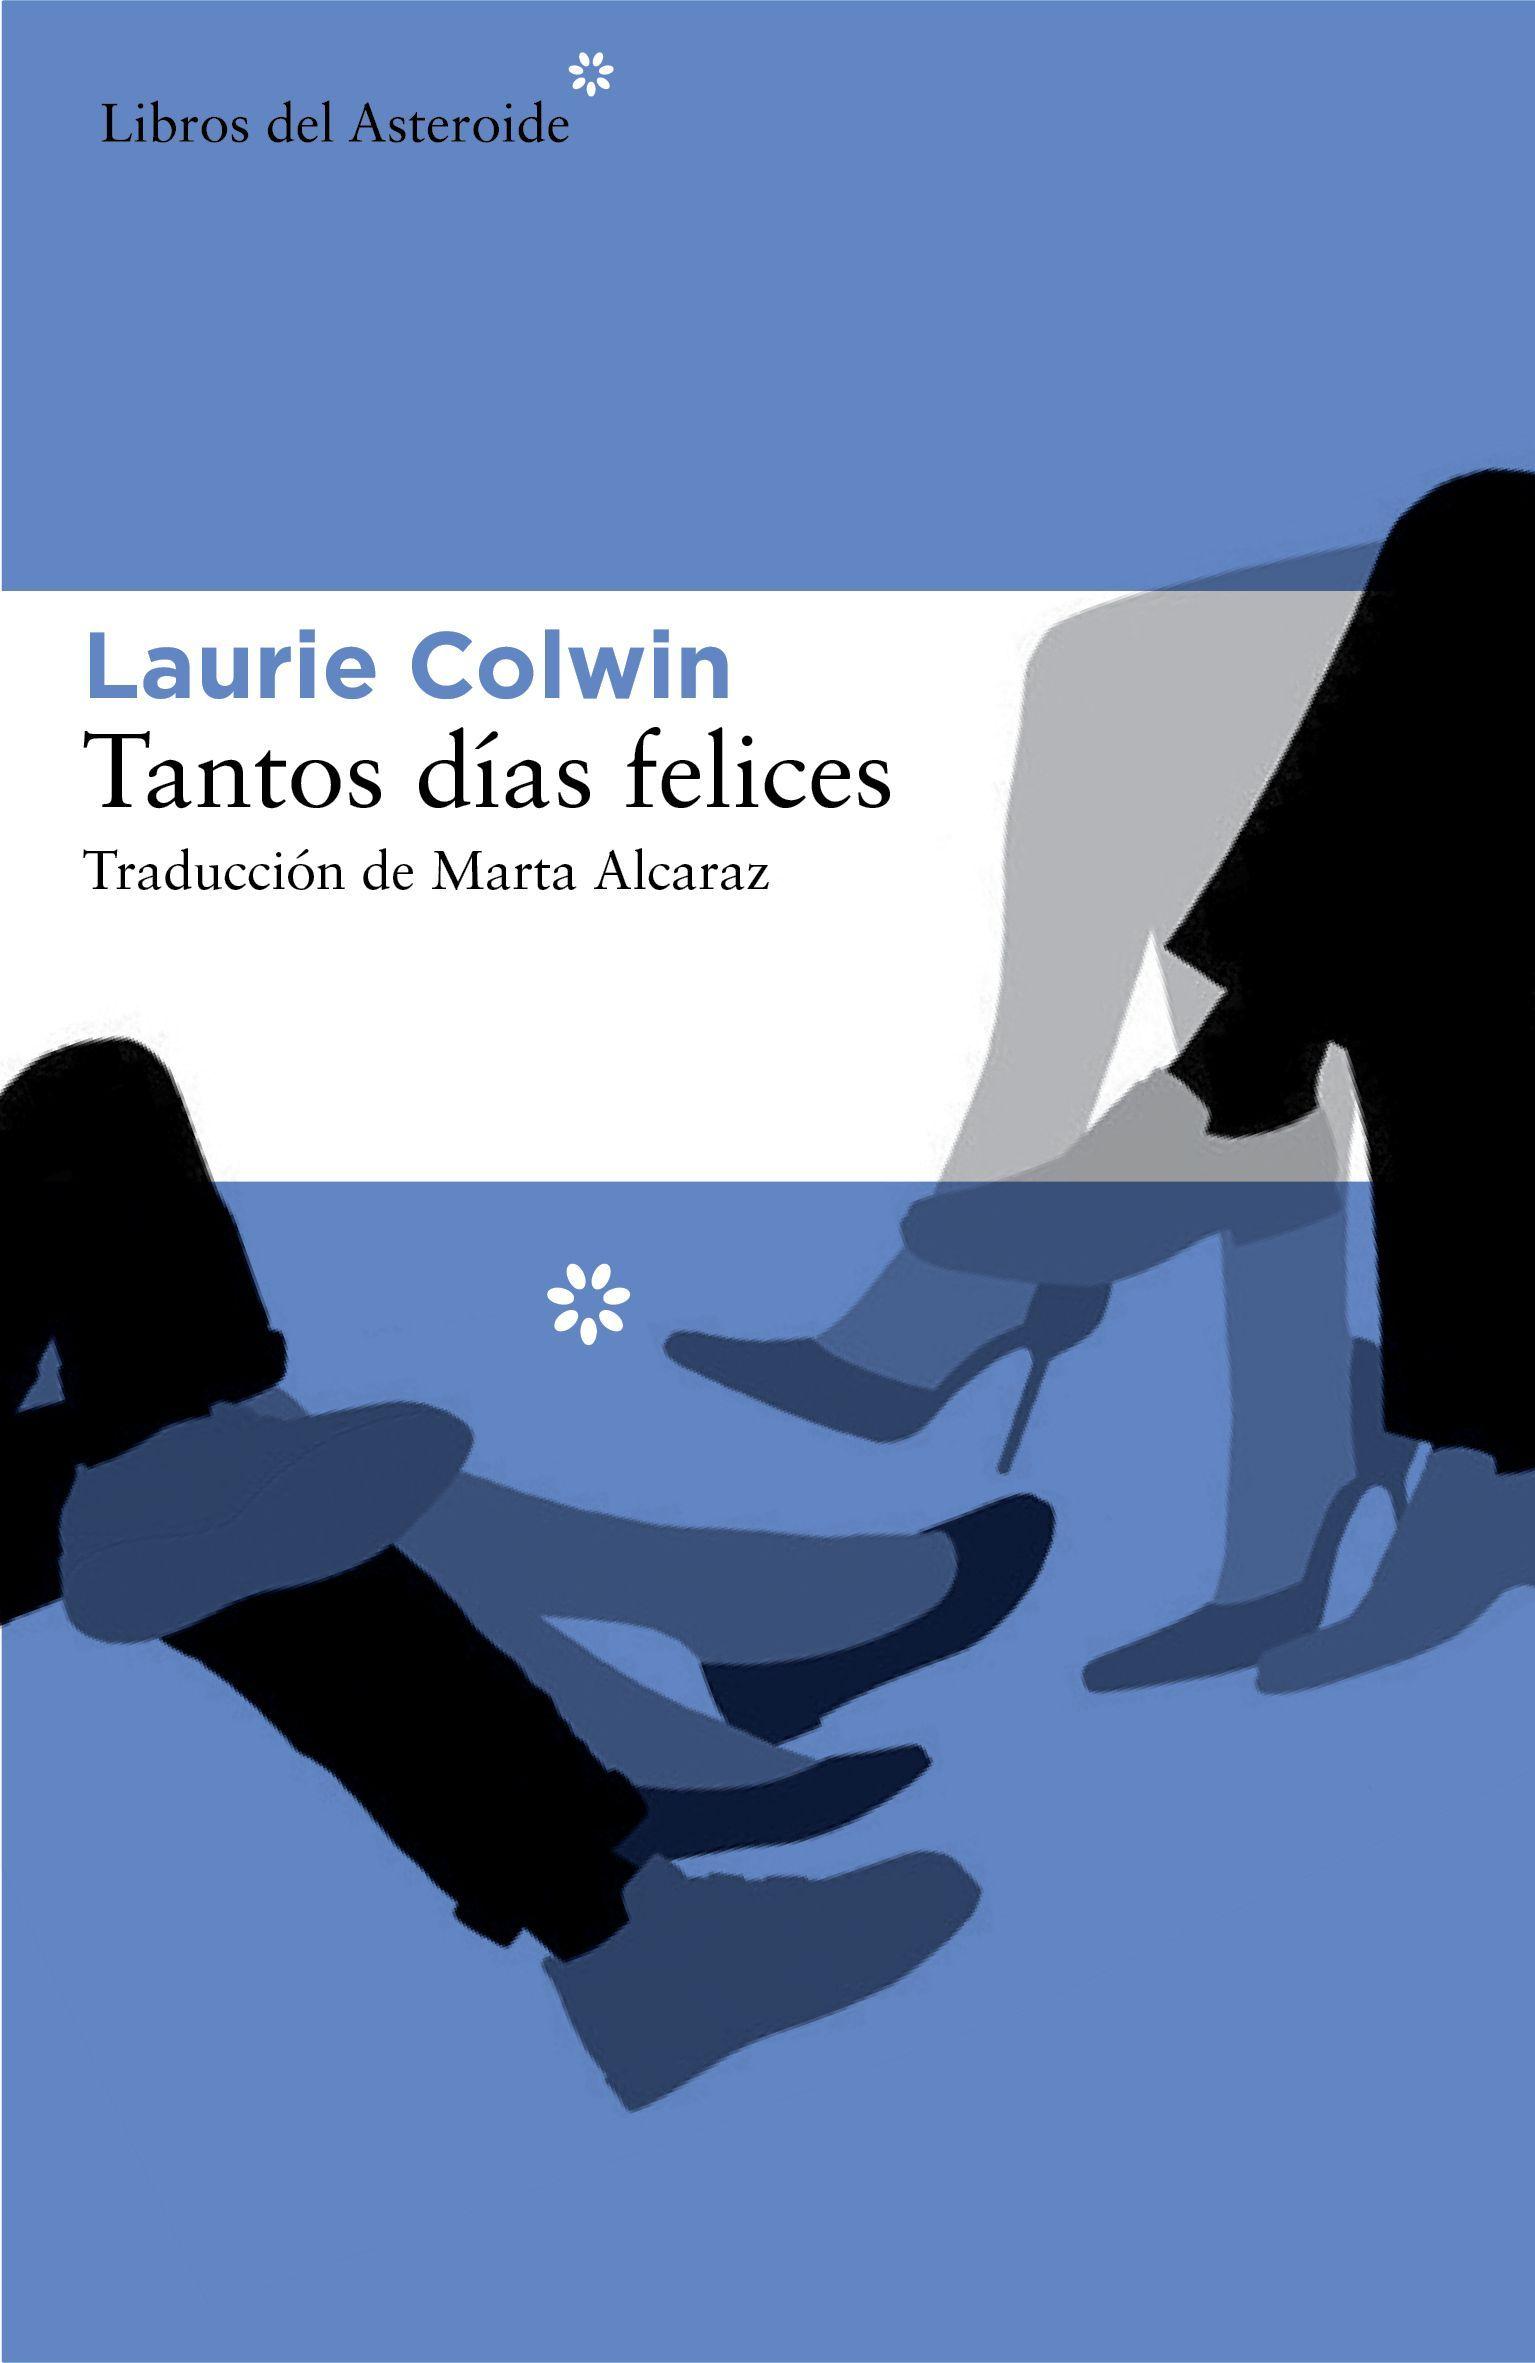 Tantos días felices - Laurie Colwin